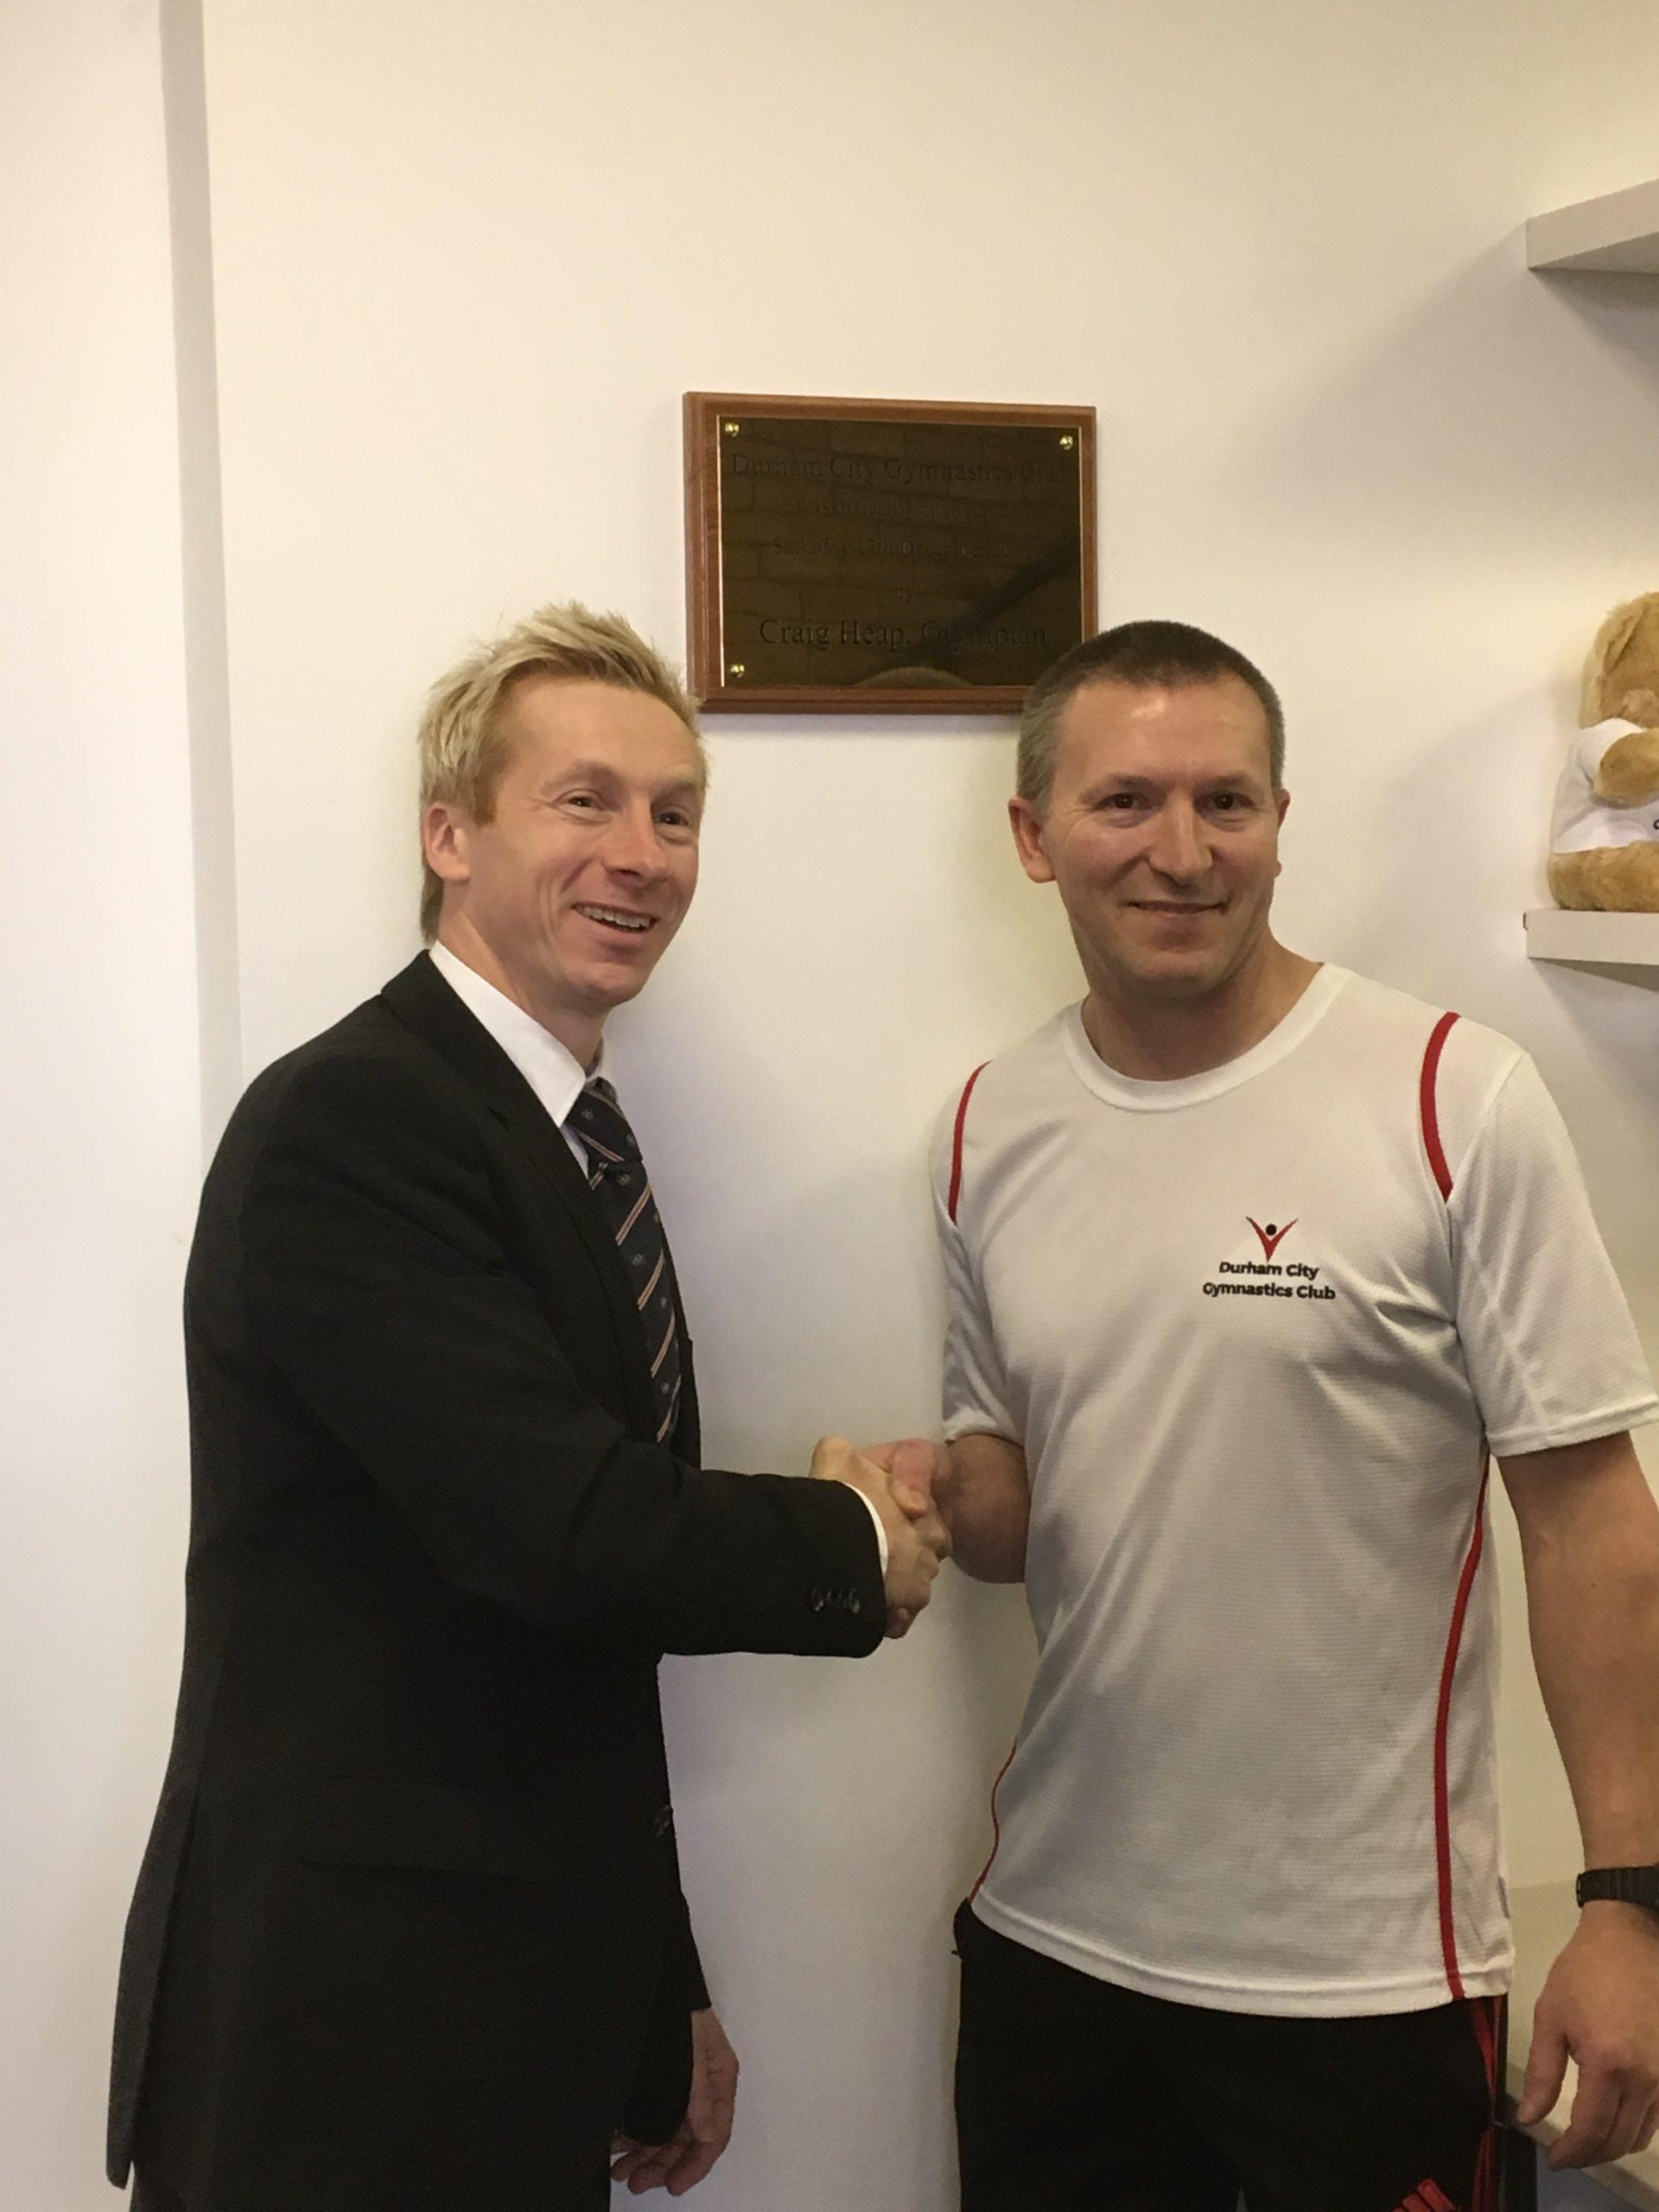 Craig Heap with Glen Wharton